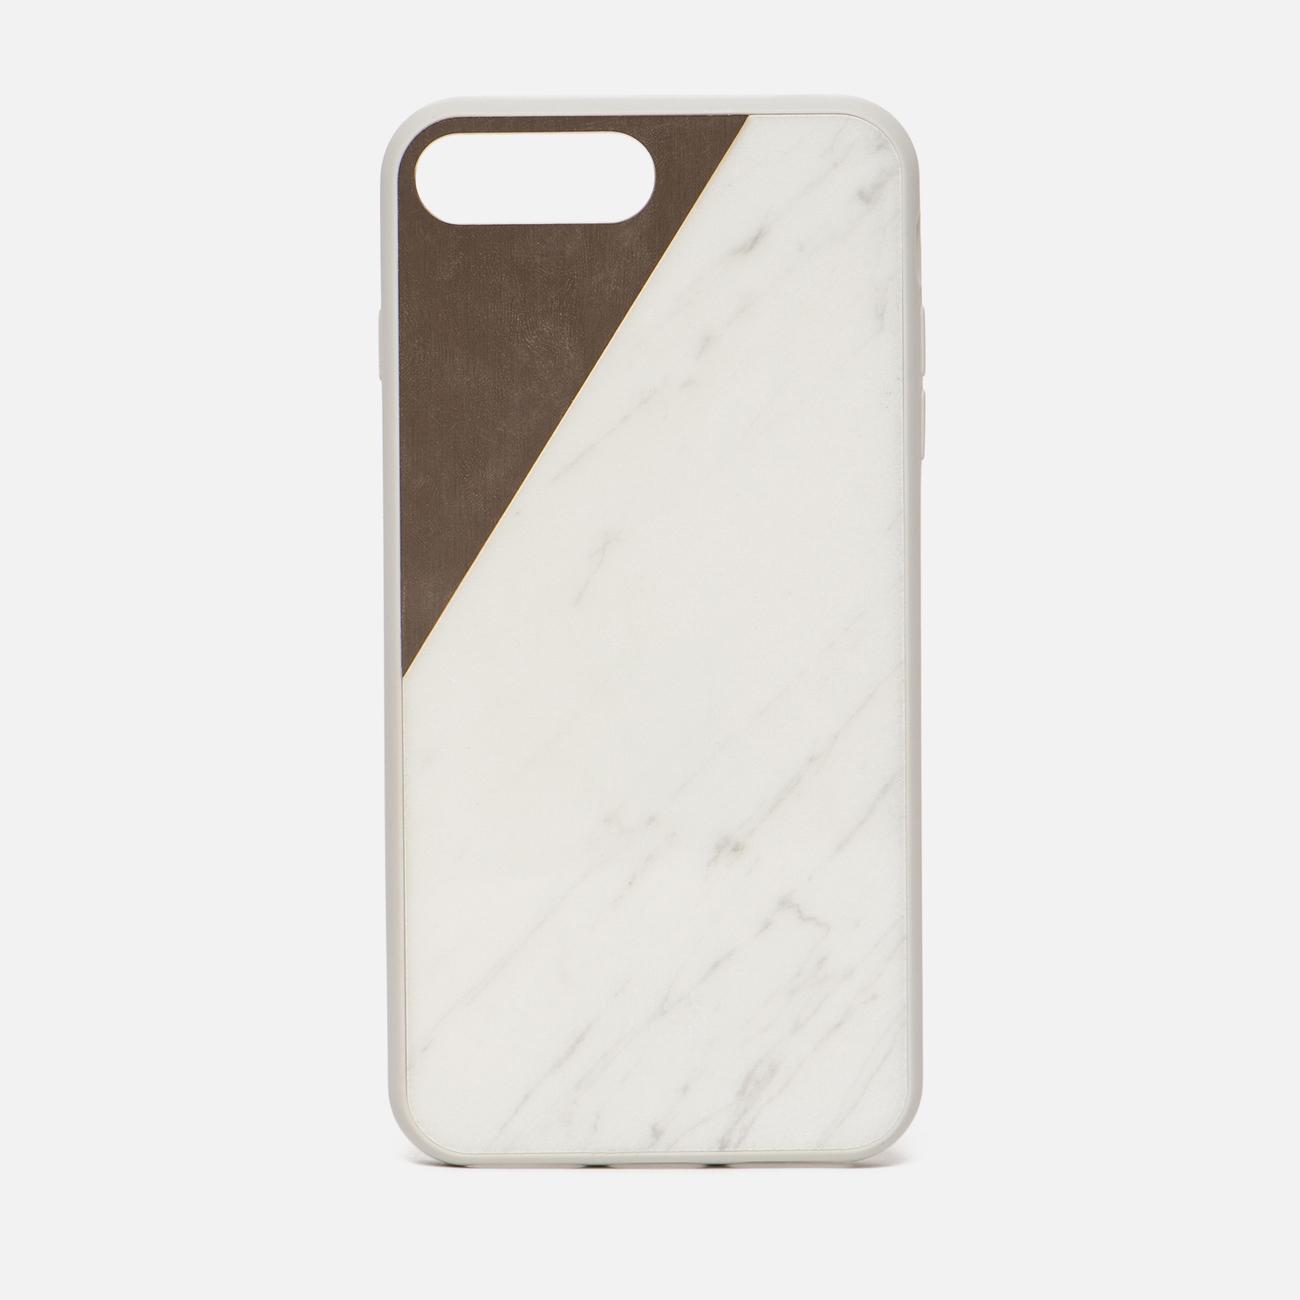 Чехол Native Union Clic Marble iPhone 7 Plus White/Rose